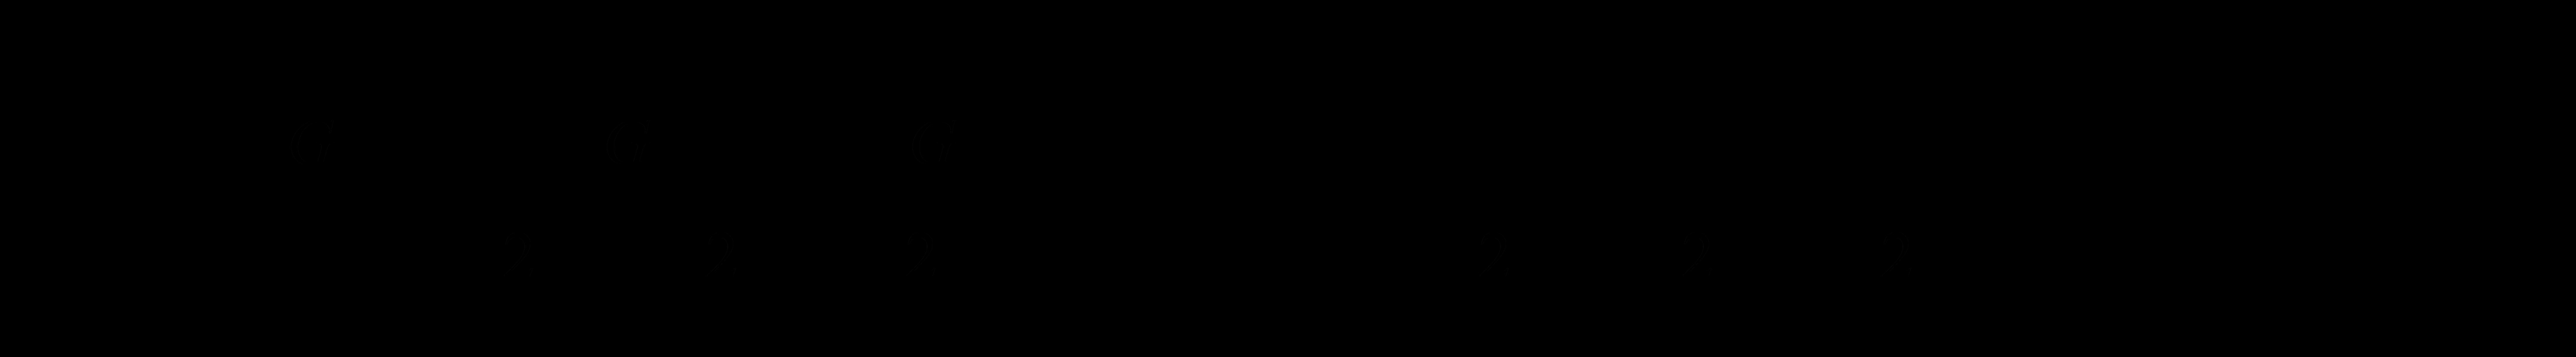 img31